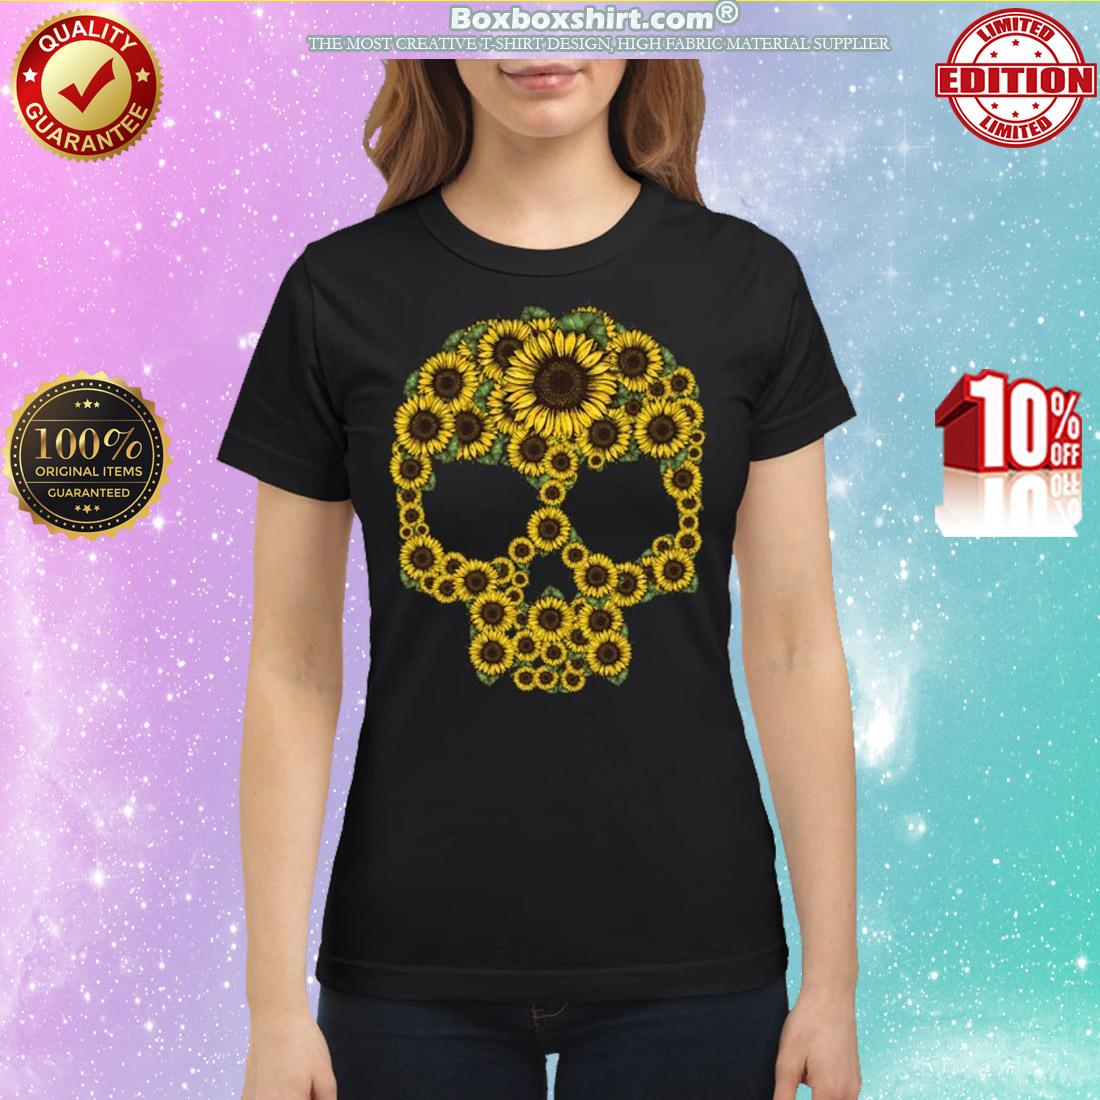 Sunflower skull classic shirt